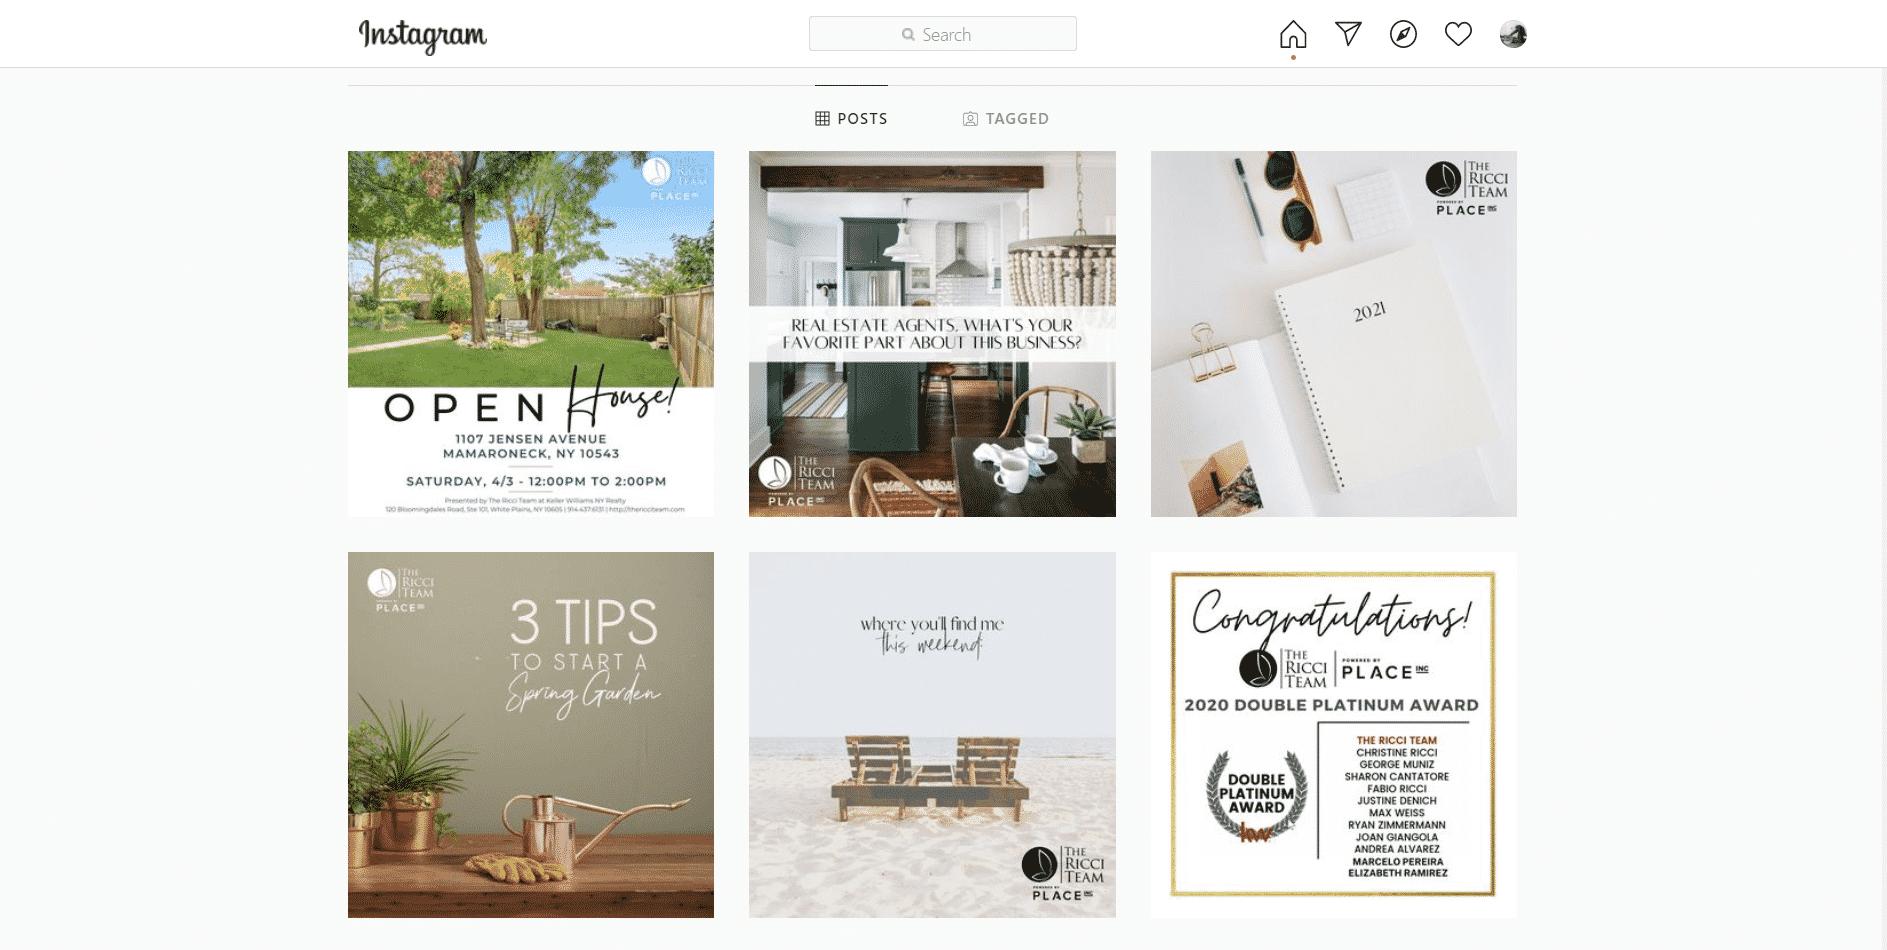 Open House Flyers for Instagram